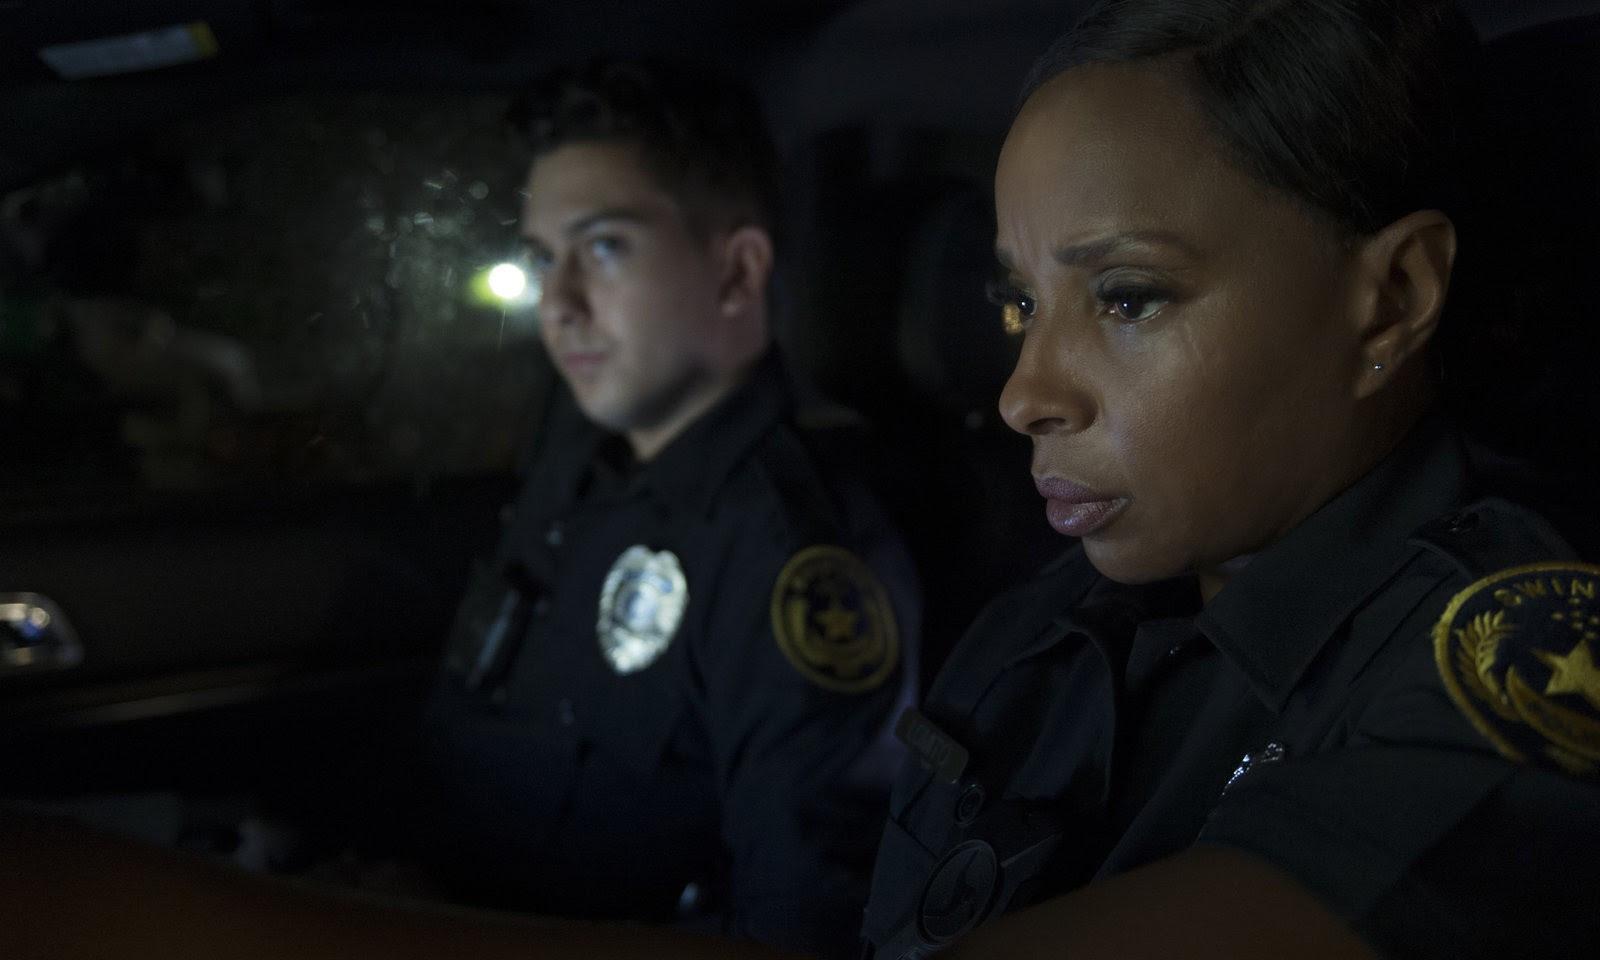 مشاهدة فيلم Body Cam (2020) مترجم HD اون لاين